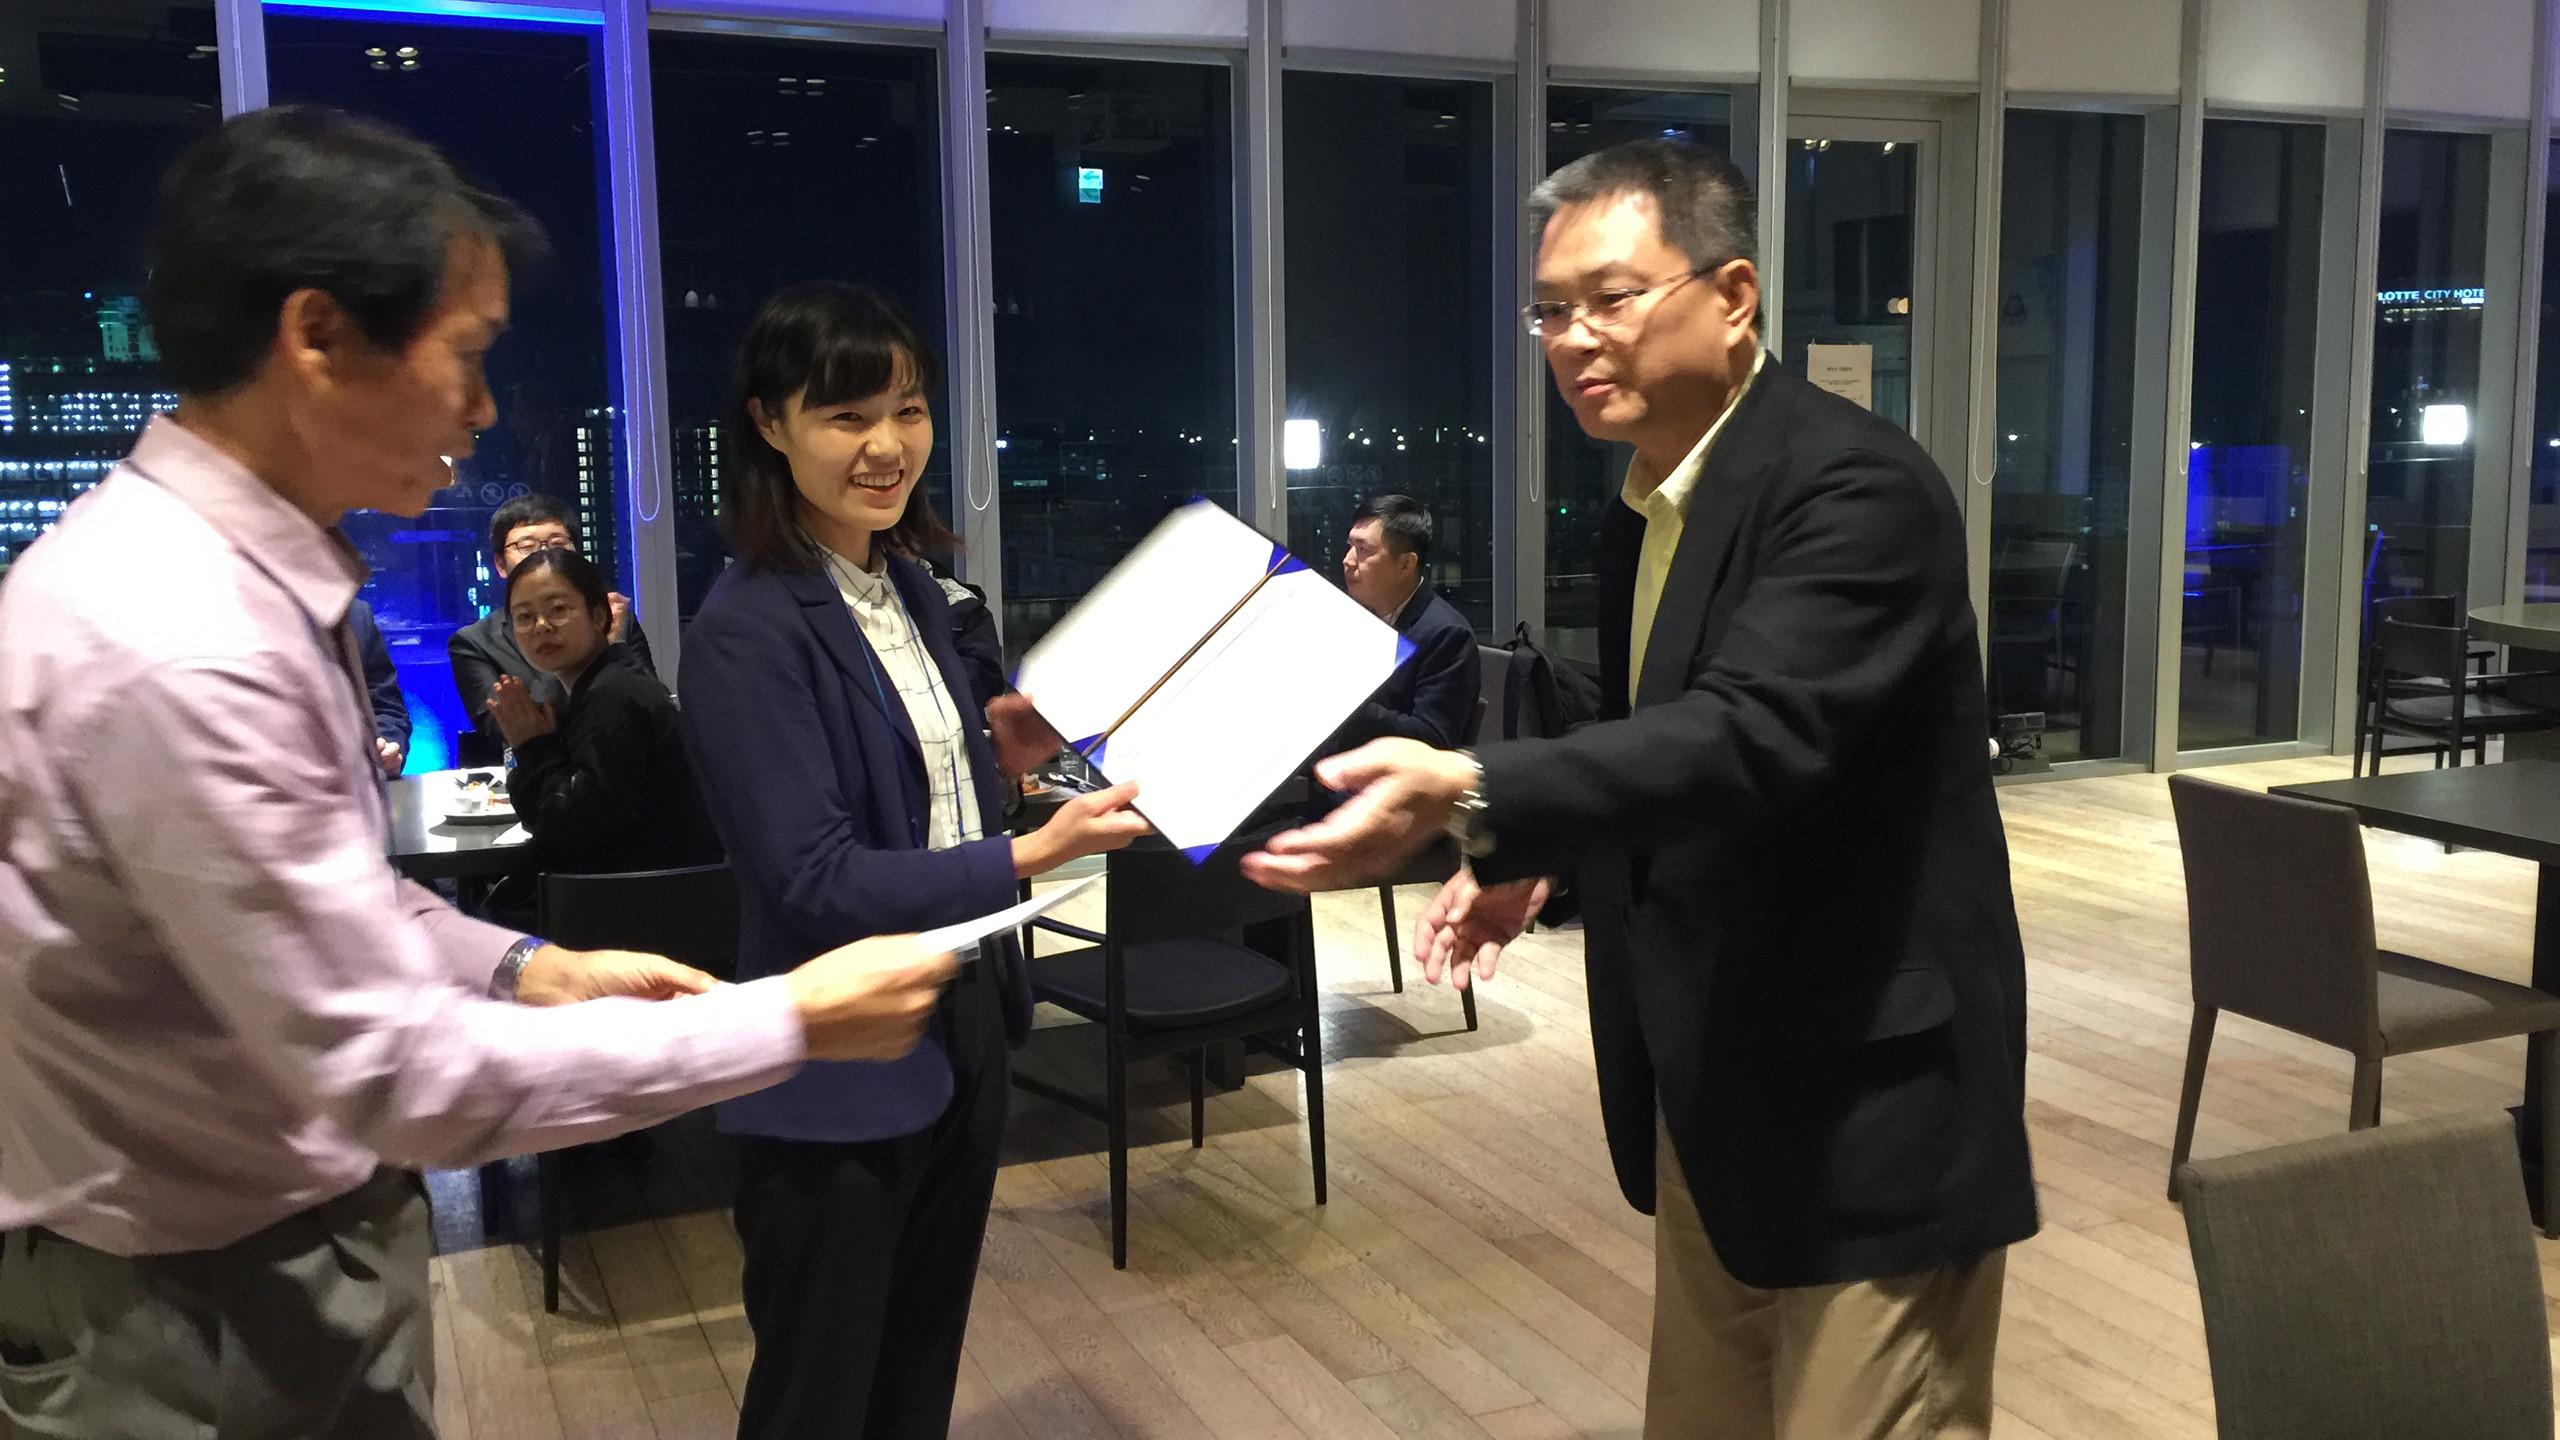 Huamei Shao receiving the award for best presentation from Chairman Yoshinori Miyamoto at AFSA 2018